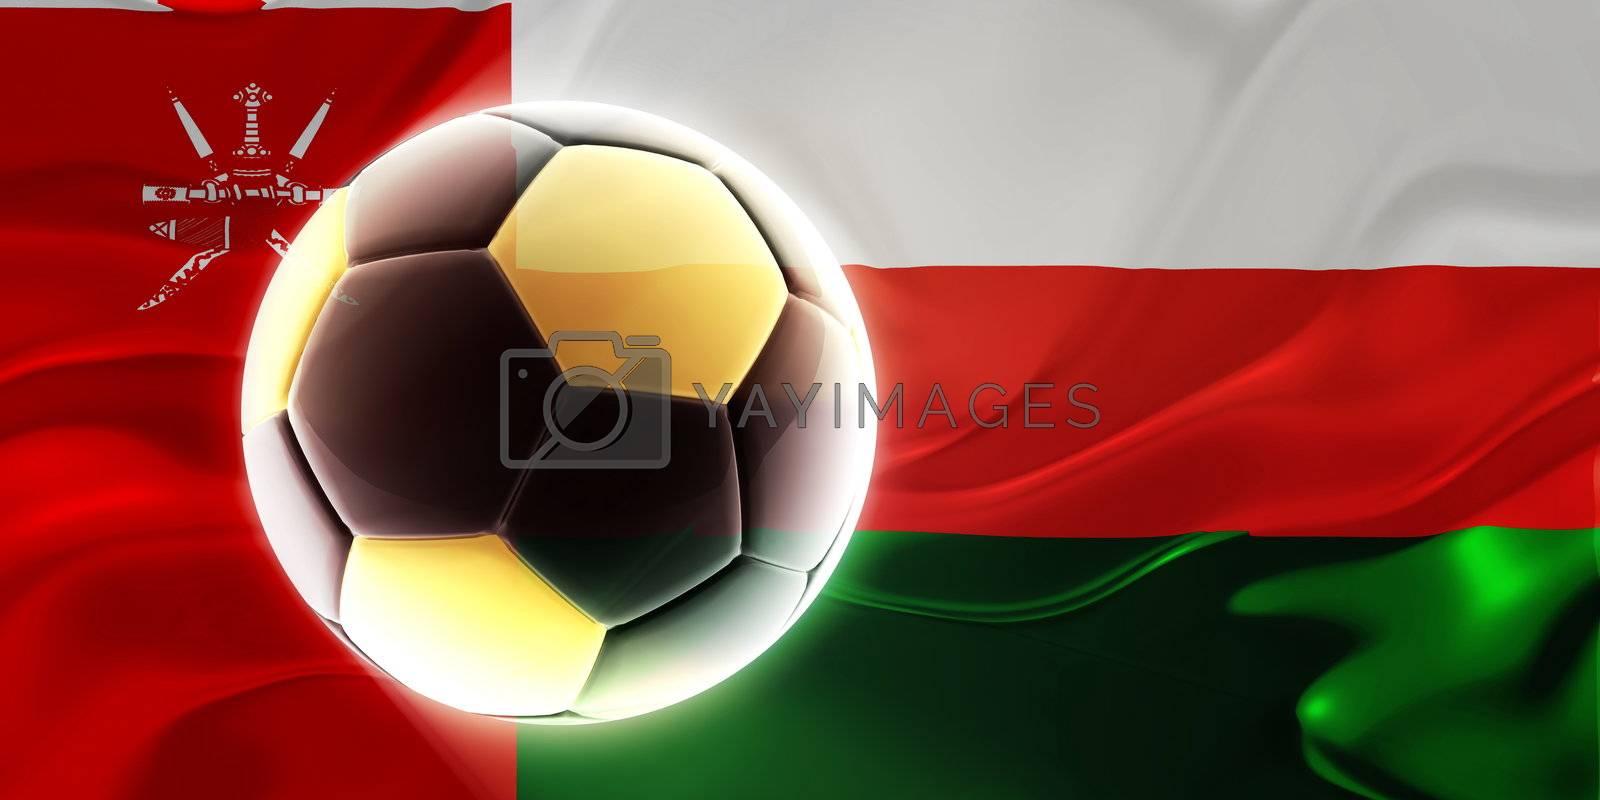 Flag of Oman, national country symbol illustration wavy fabric sports soccer football